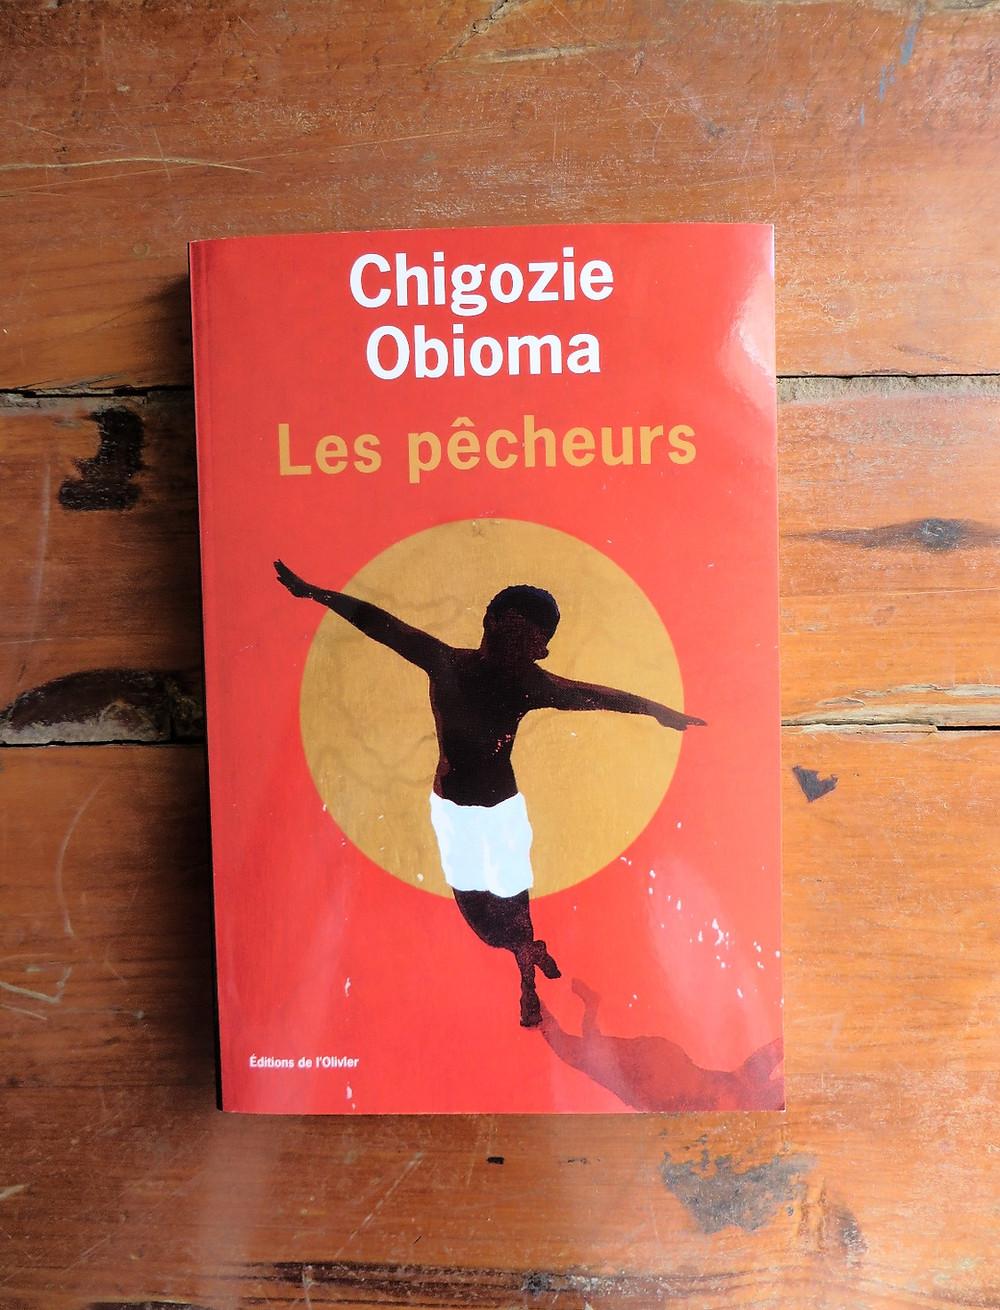 Photo : Les pêcheurs, Chigozie Obioma